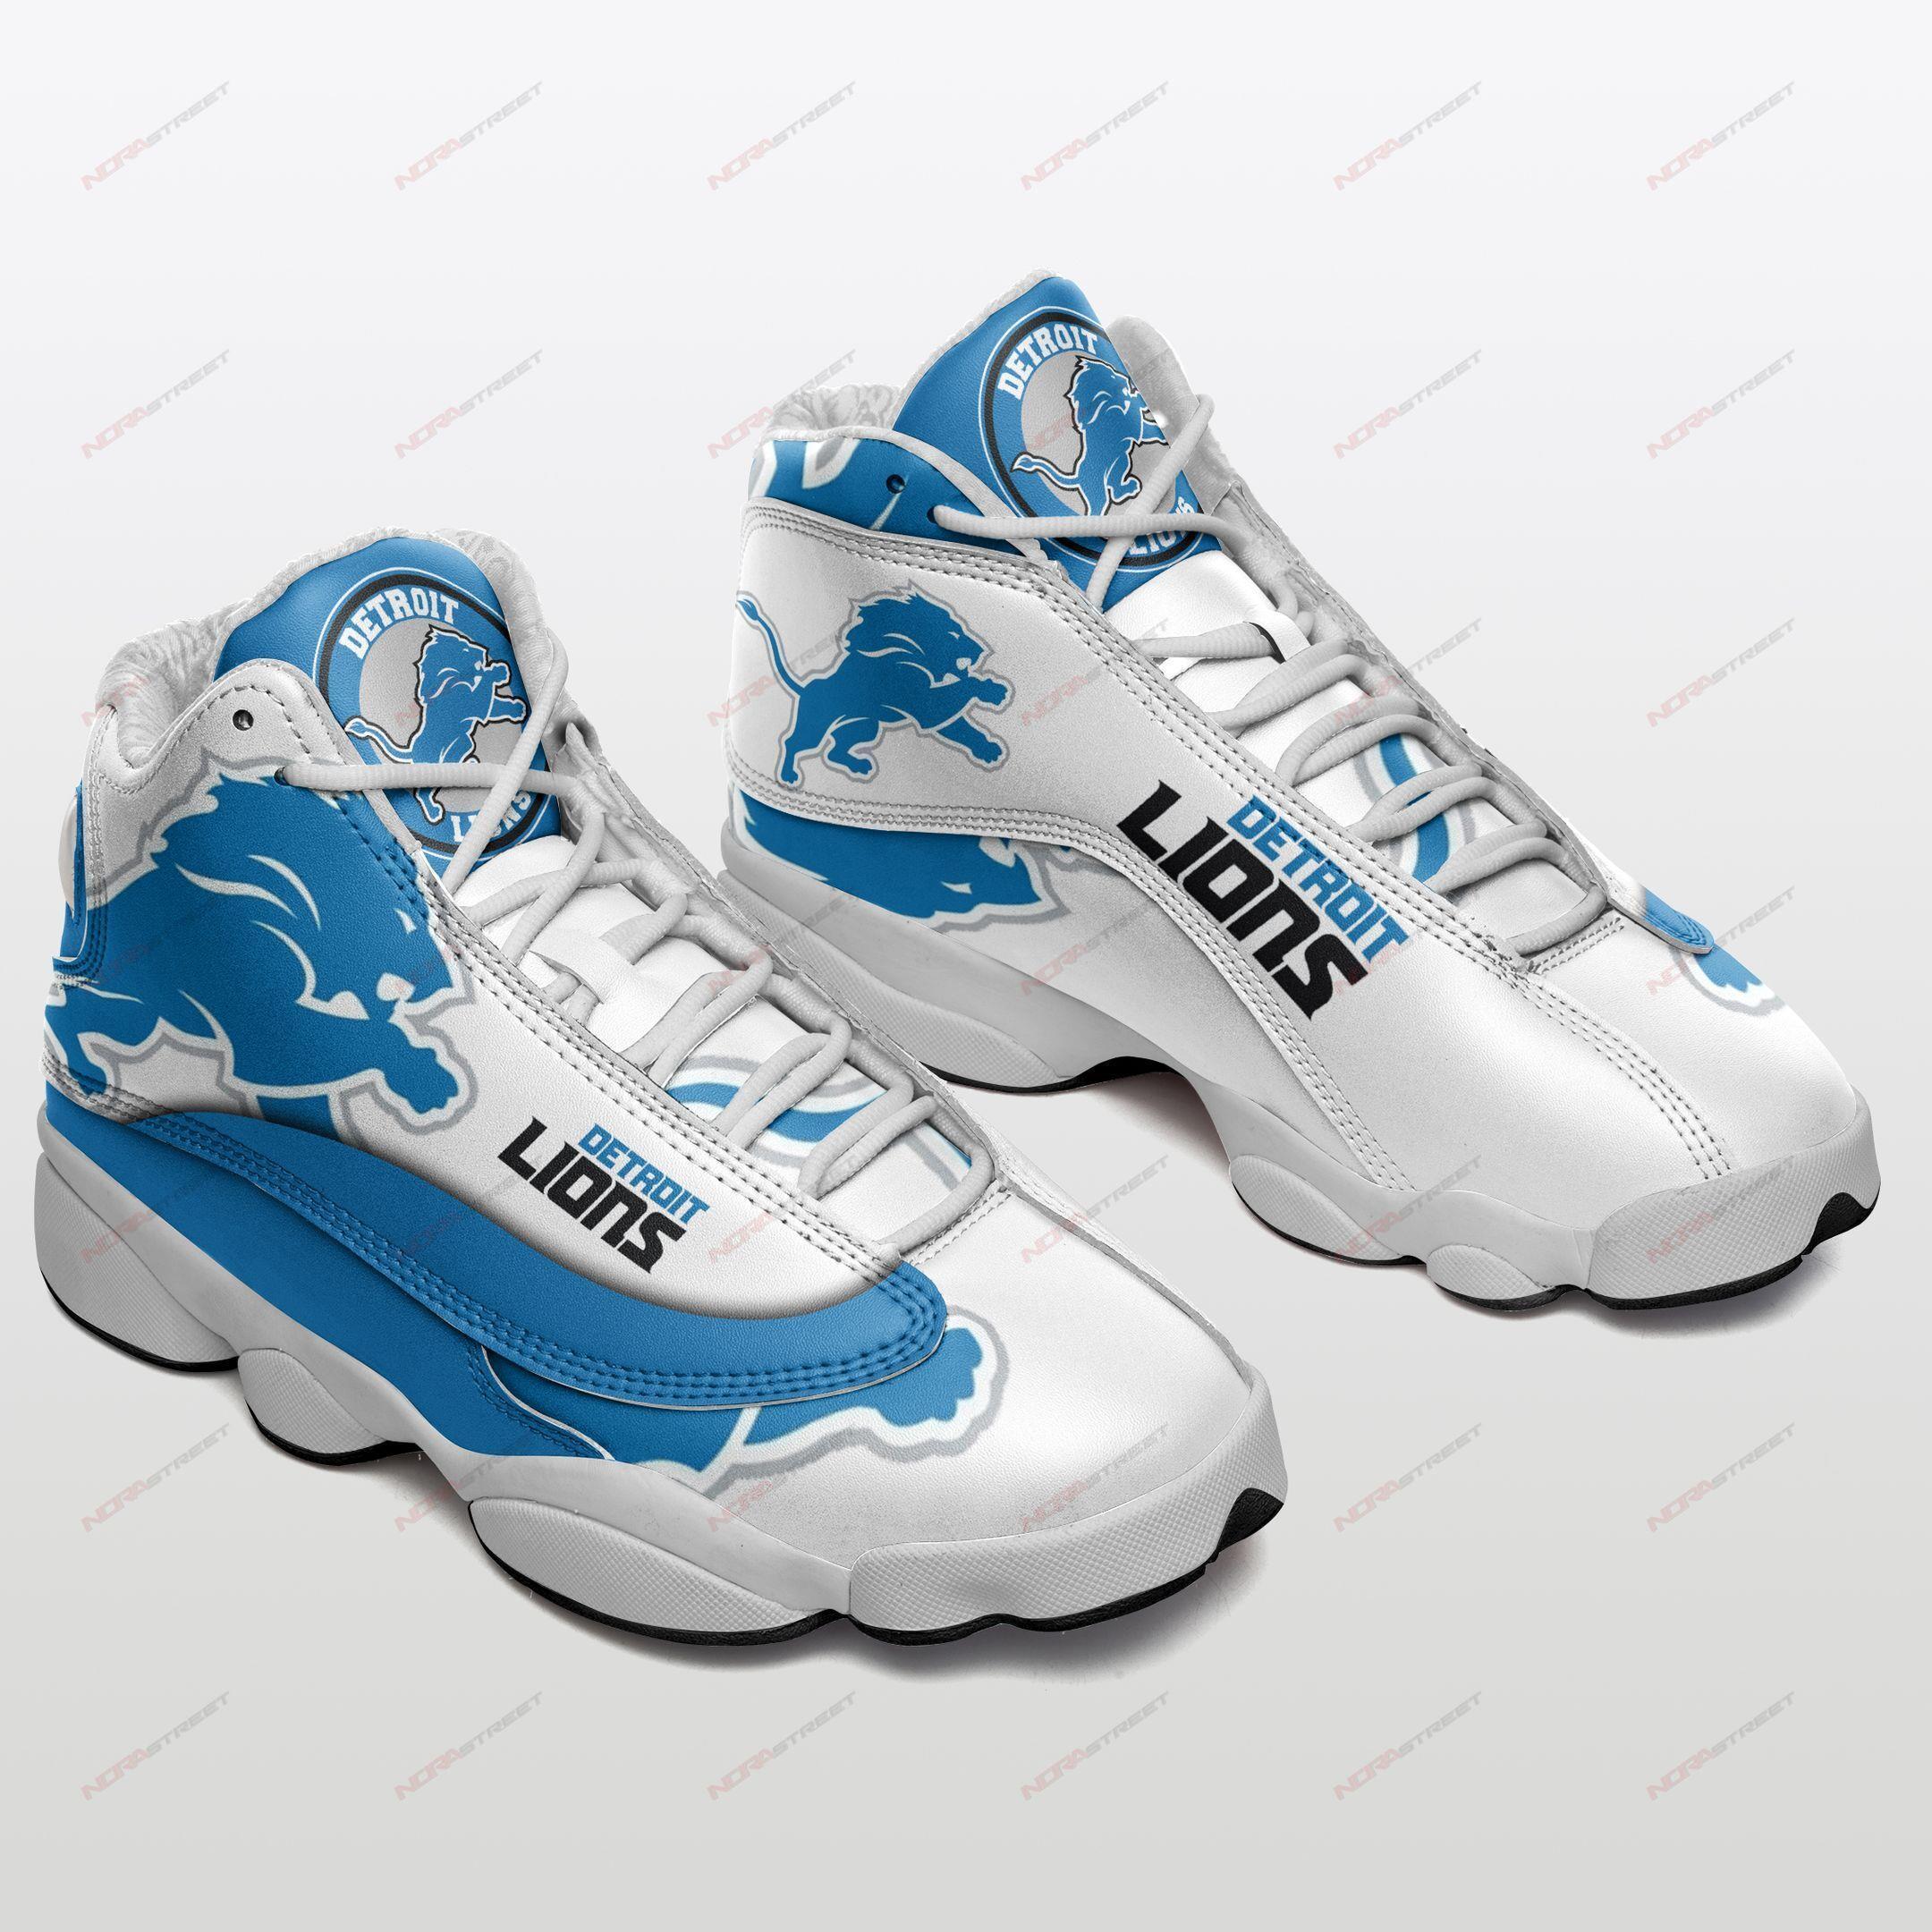 Detroit Lions Air Jordan 13 Sneakers Sport Shoes Full Size